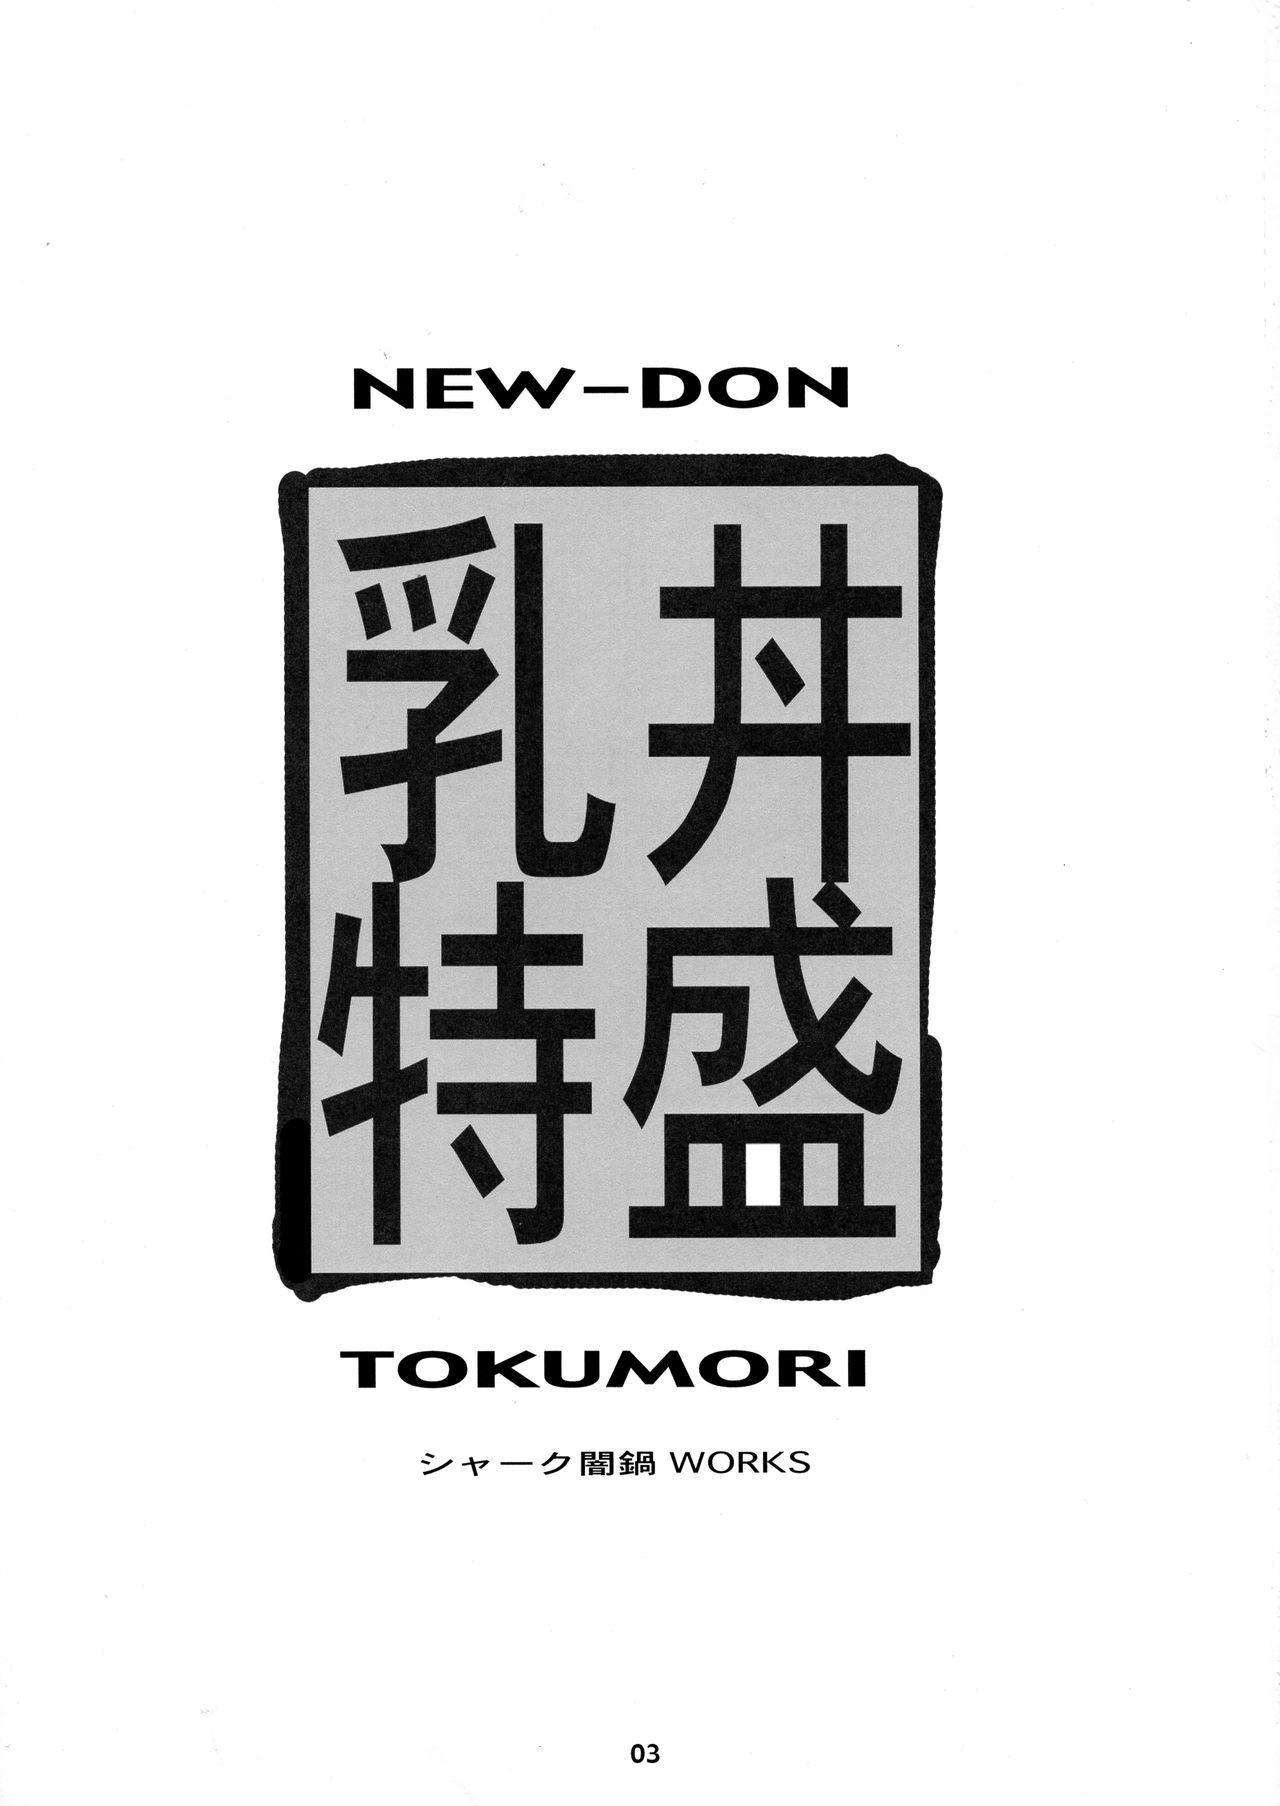 Chichi Donburi Tokumori 2